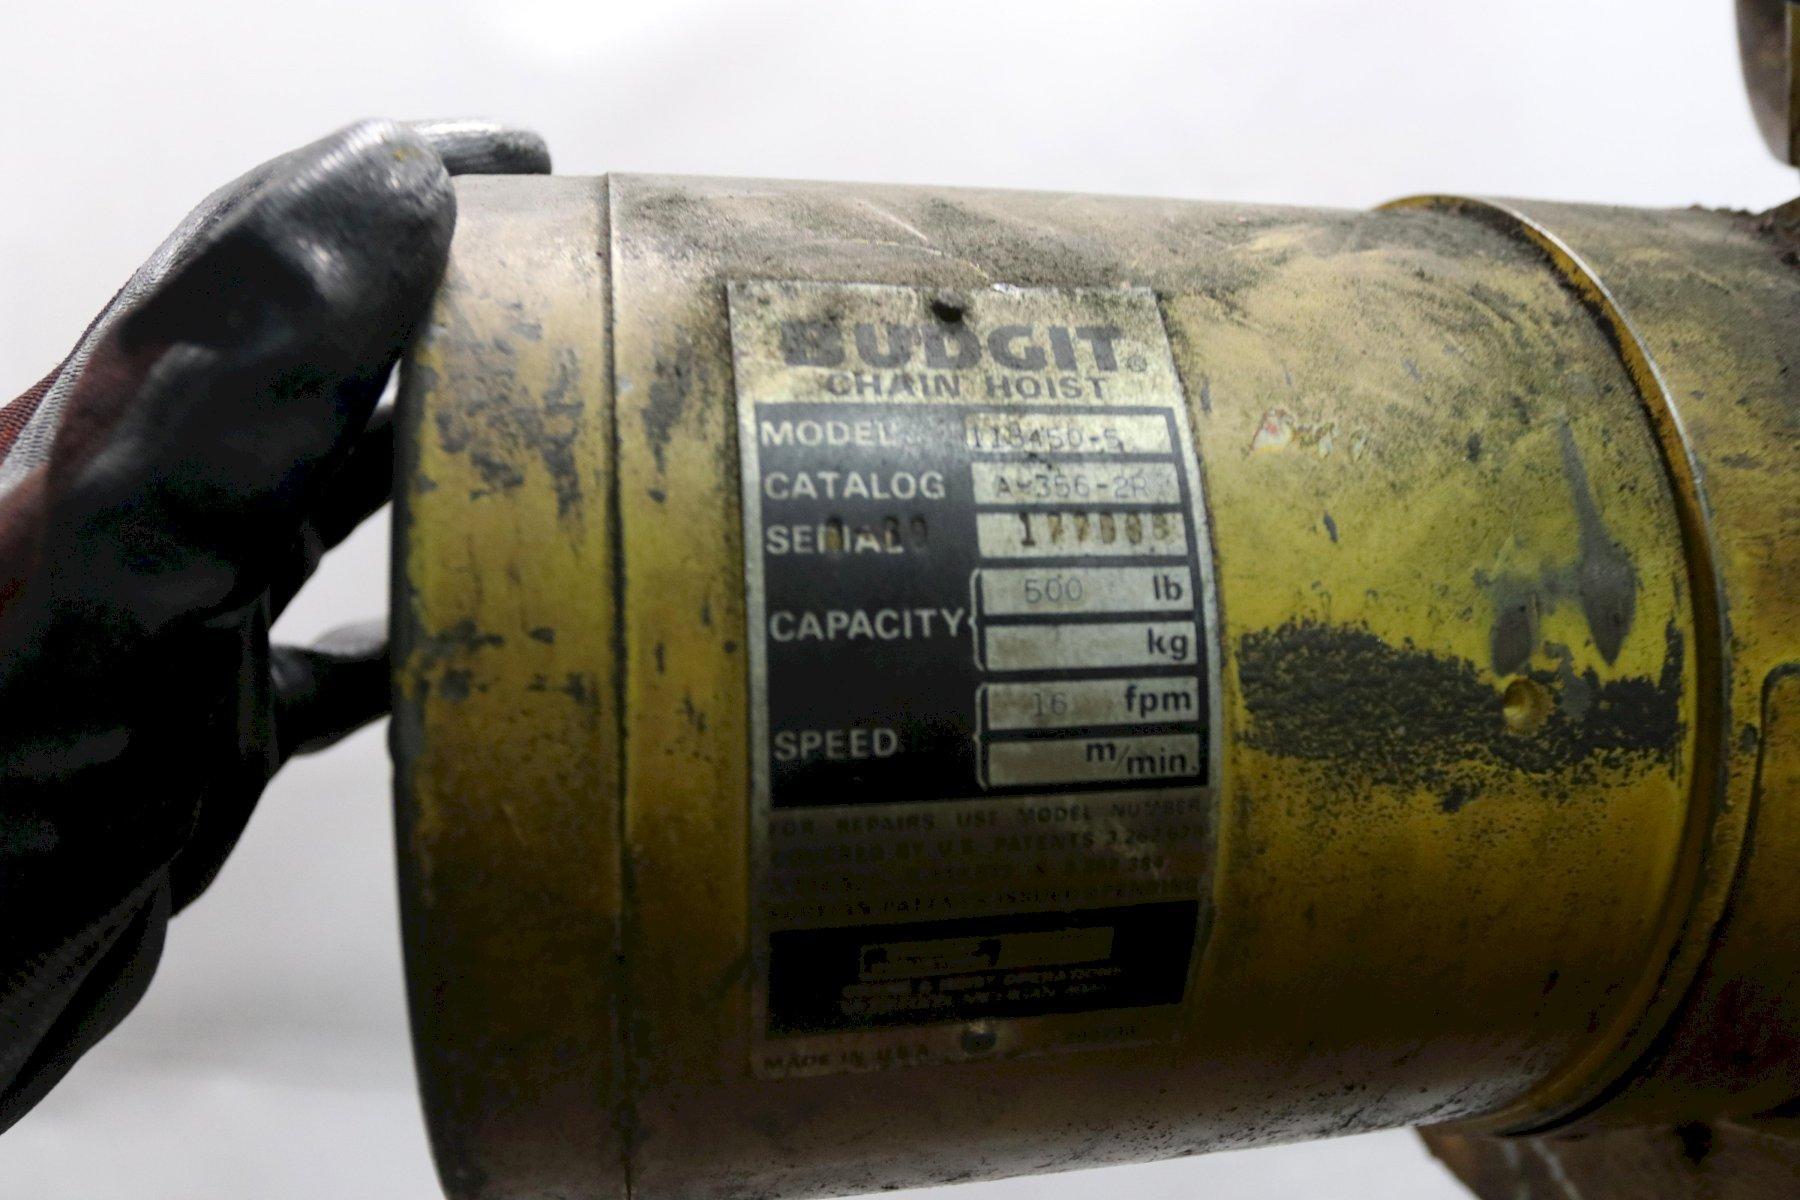 500 LB BUDGIT ELECTRIC POWERED CHAIN HOIST: STOCK #11967